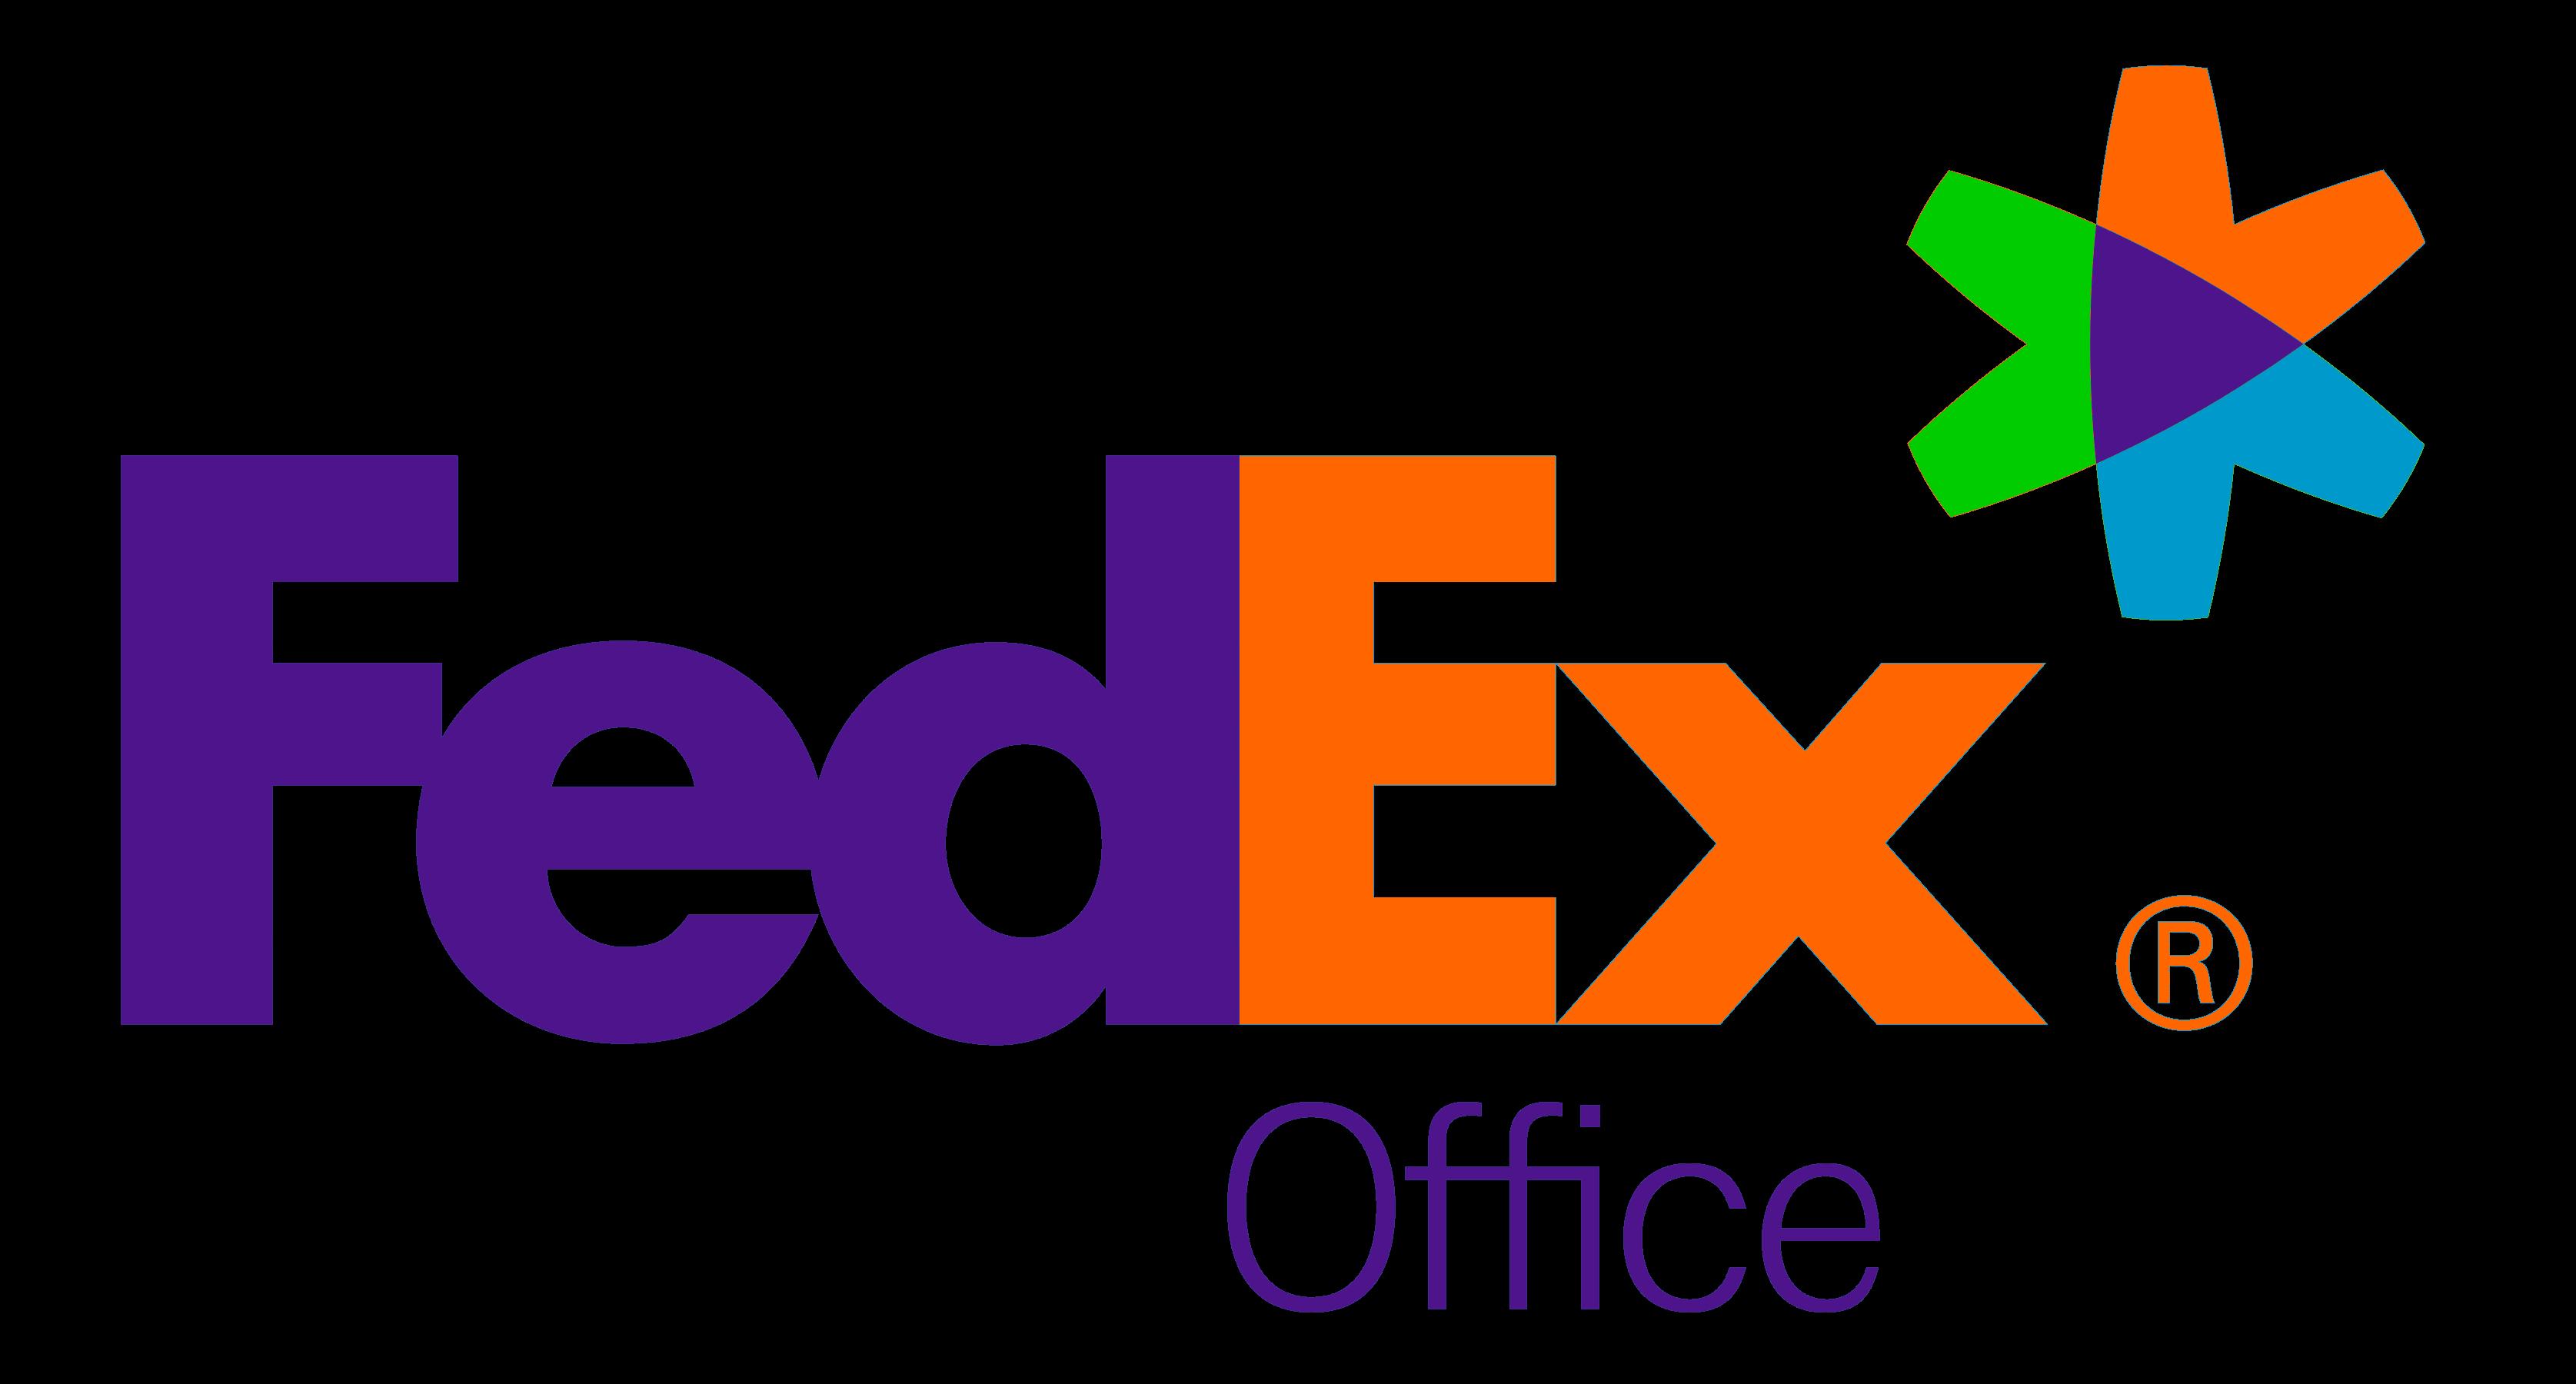 Fedex Office PNG Transparent Fedex Office.PNG Images..